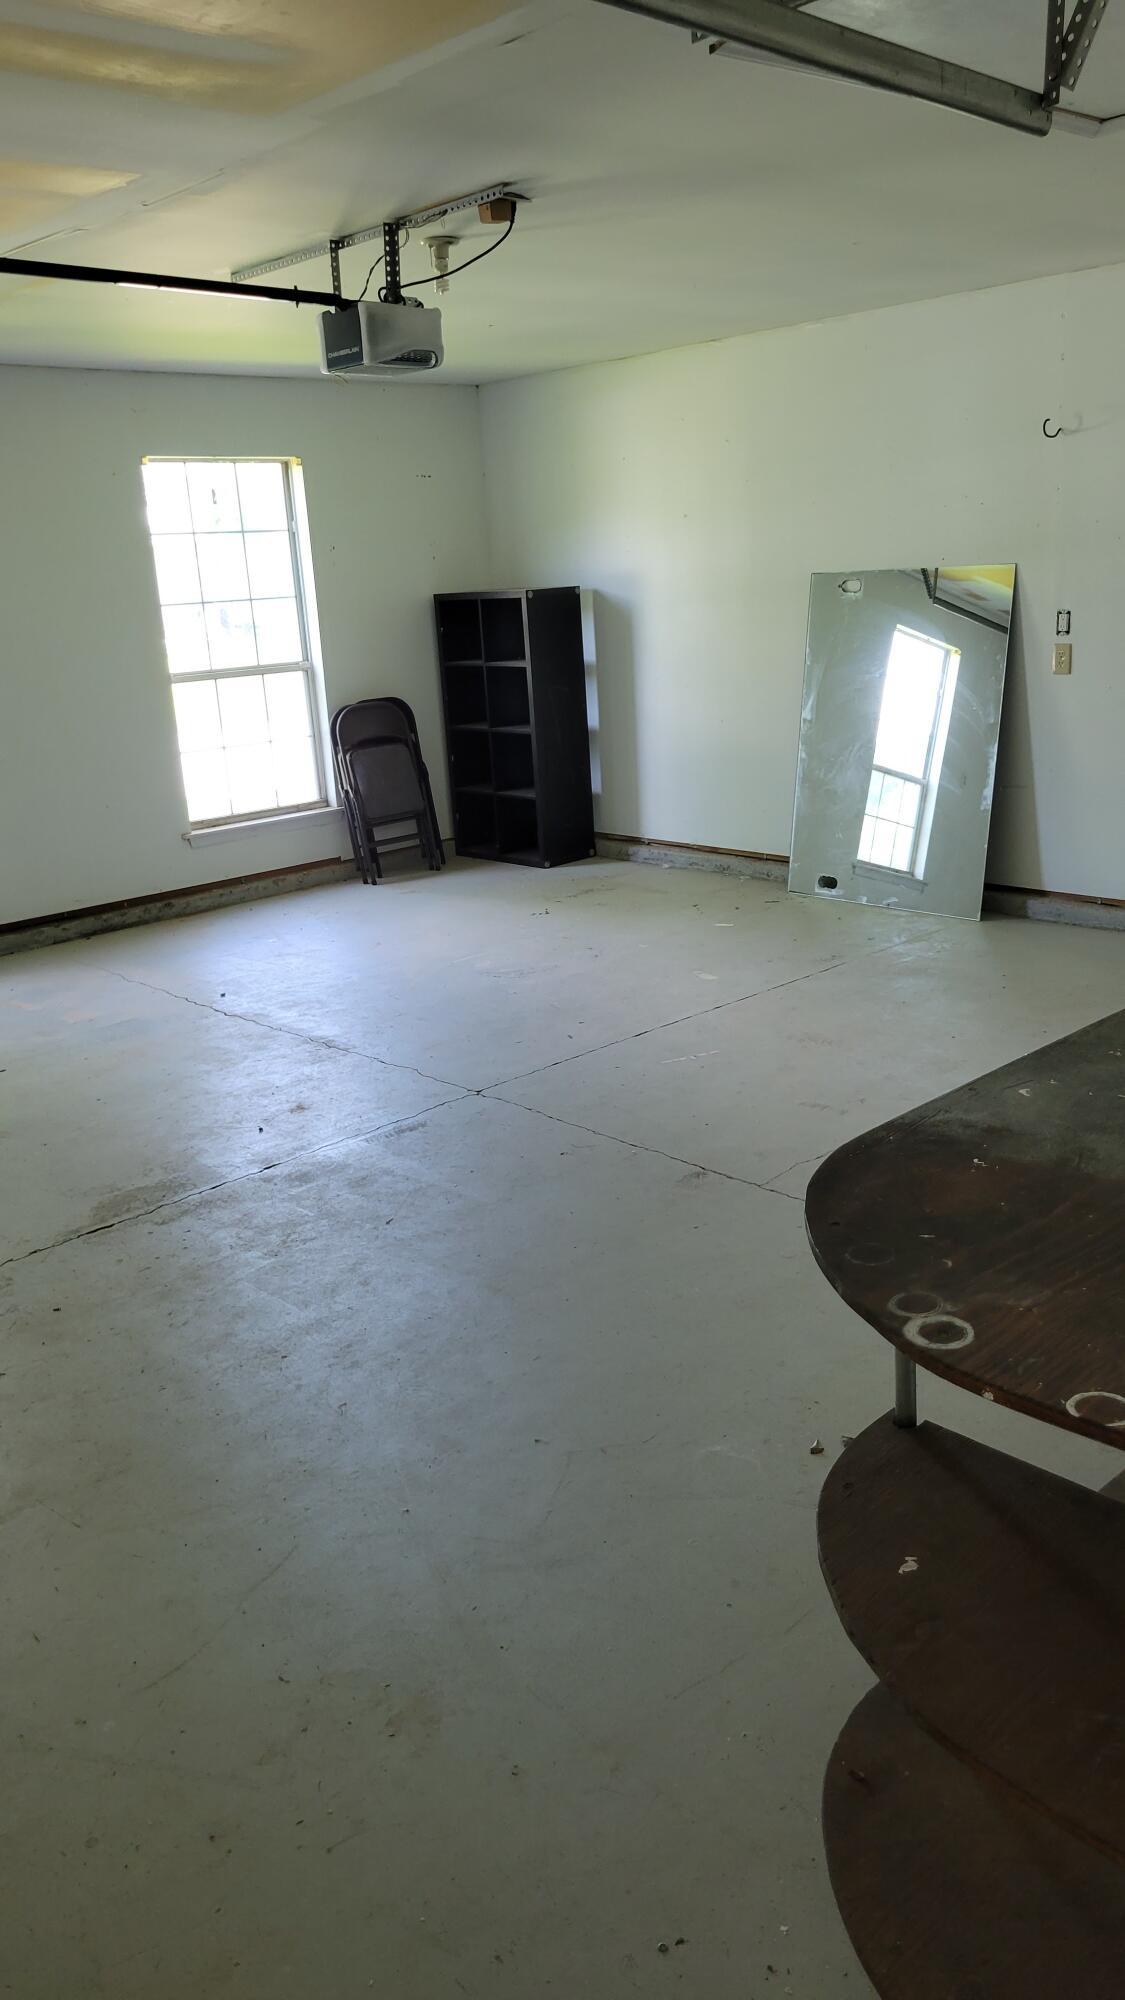 Dunes West Homes For Sale - 2652 Palmetto Hall, Mount Pleasant, SC - 3